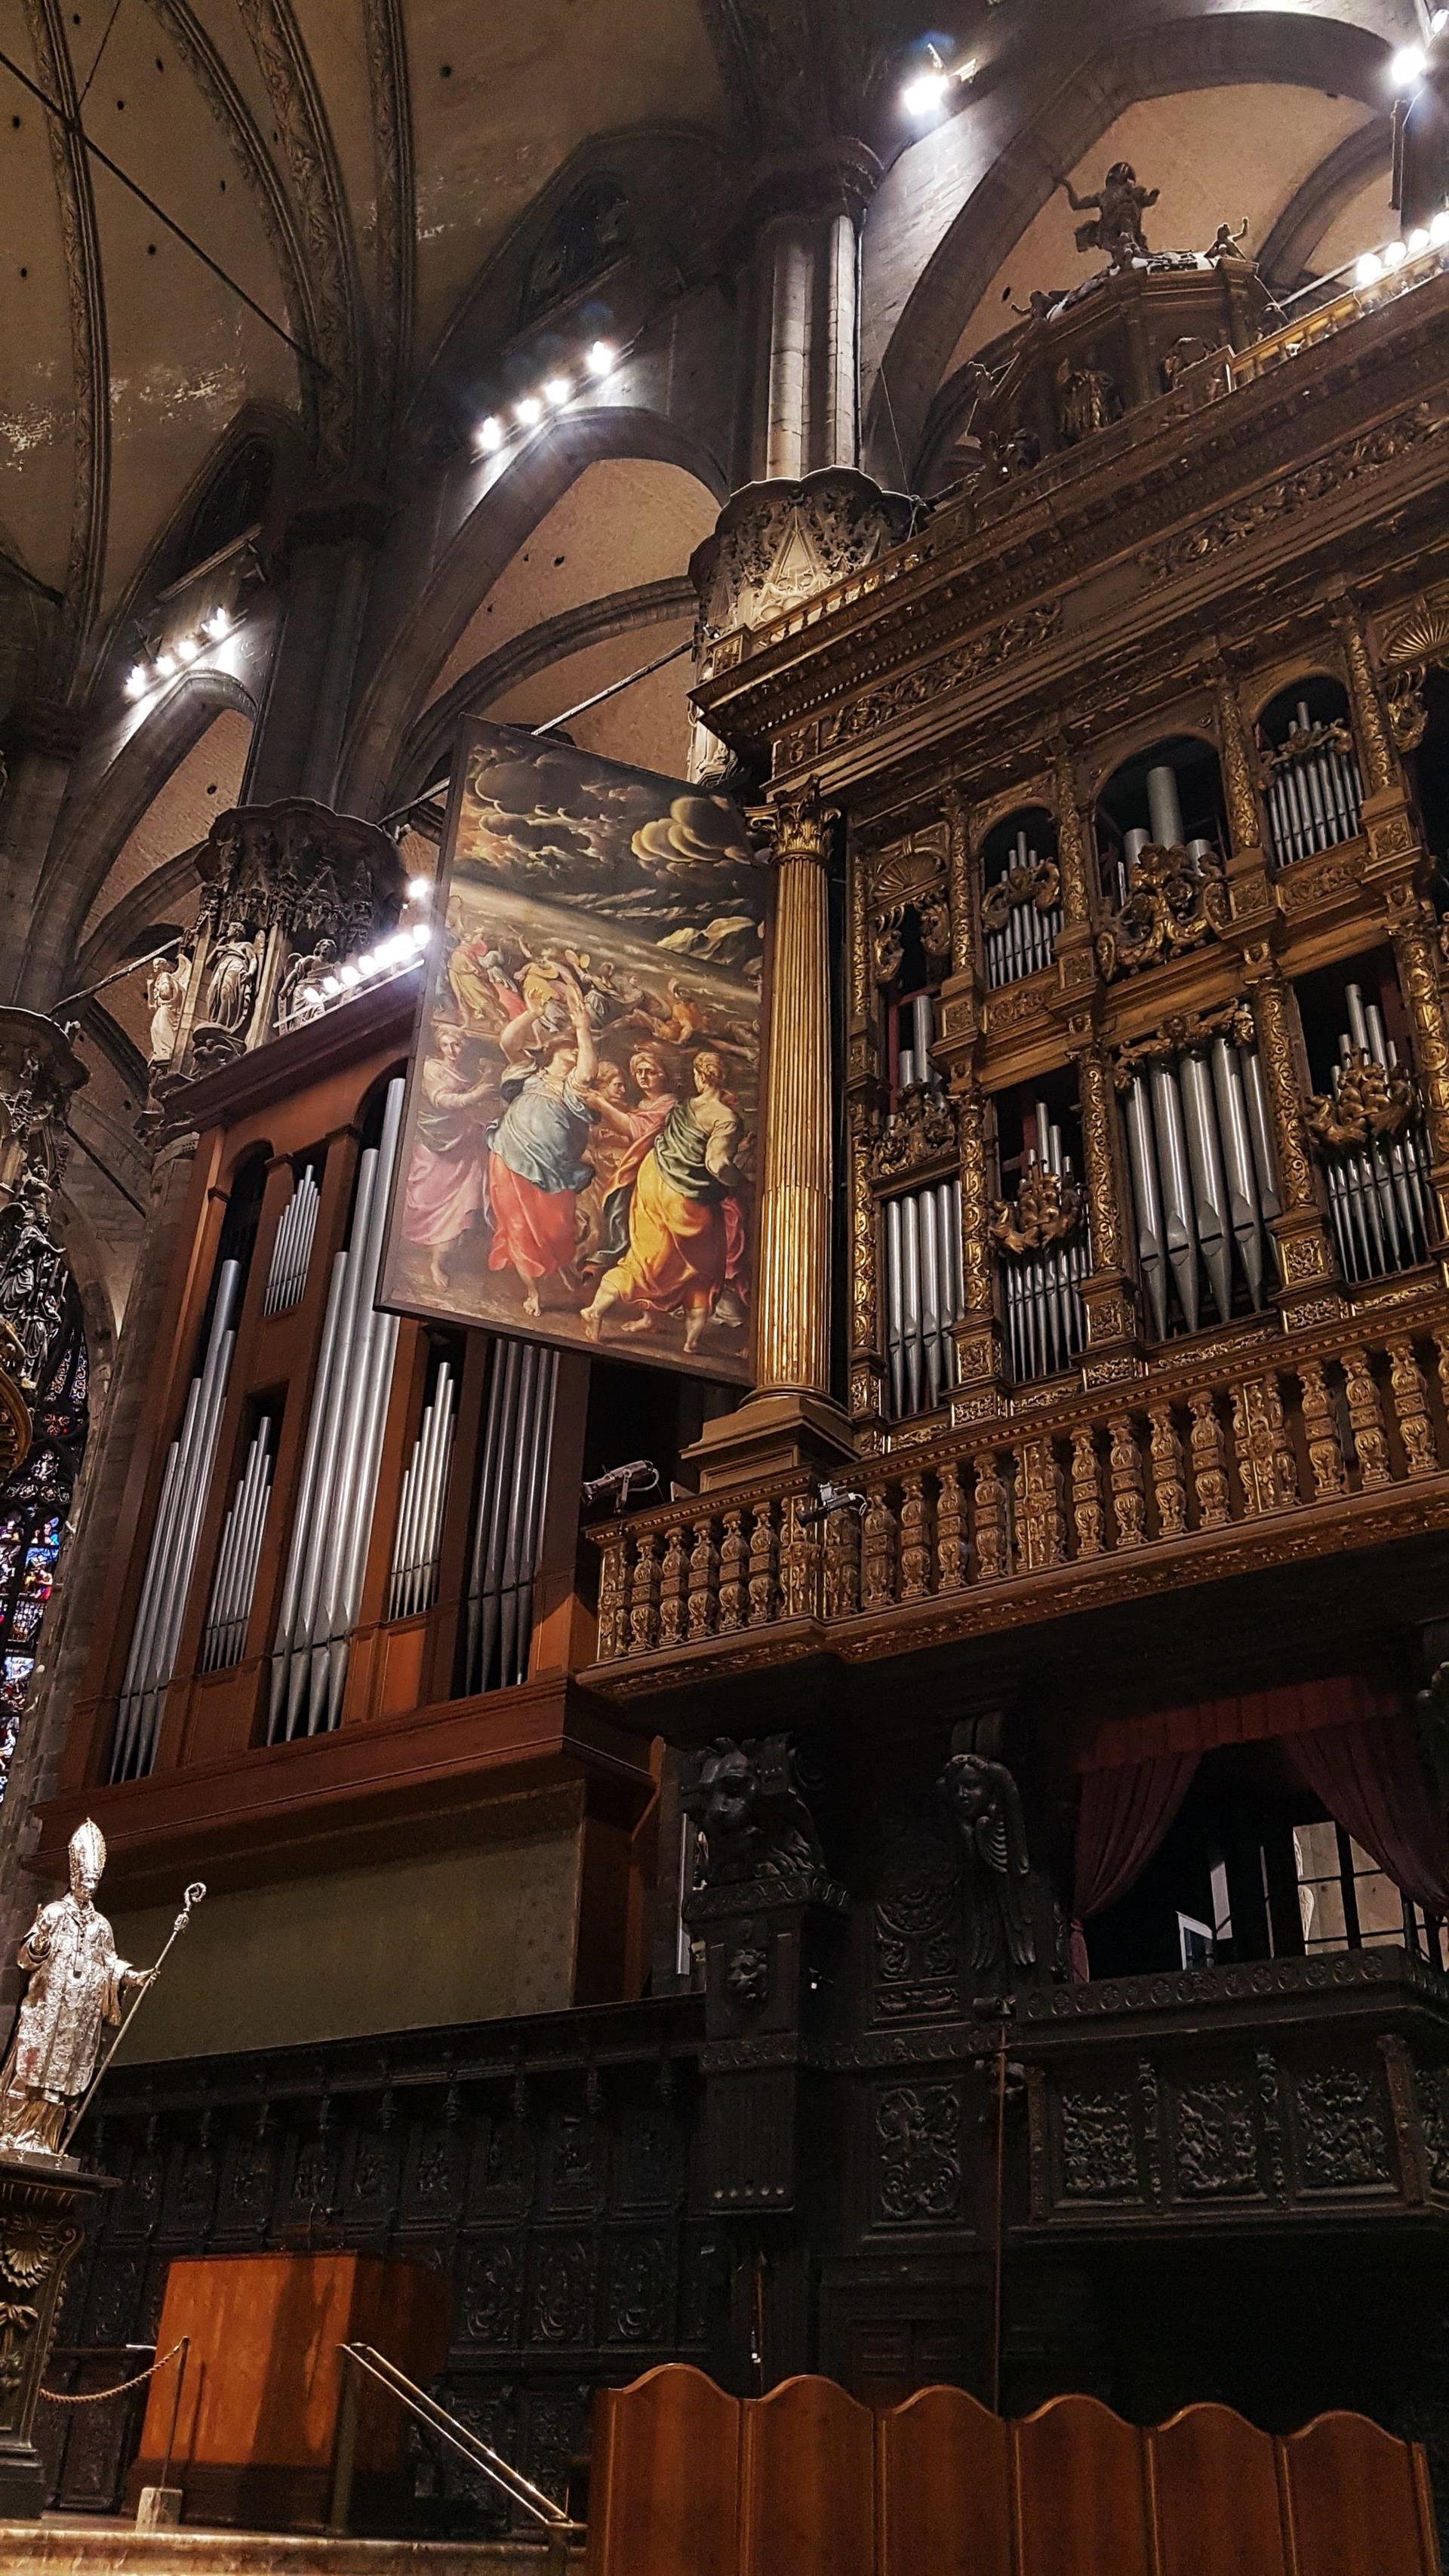 © Veneranda Fabbrica Del Duomo Di Milano Uno Sguardo Sul Grande Organo Del Duomo 2